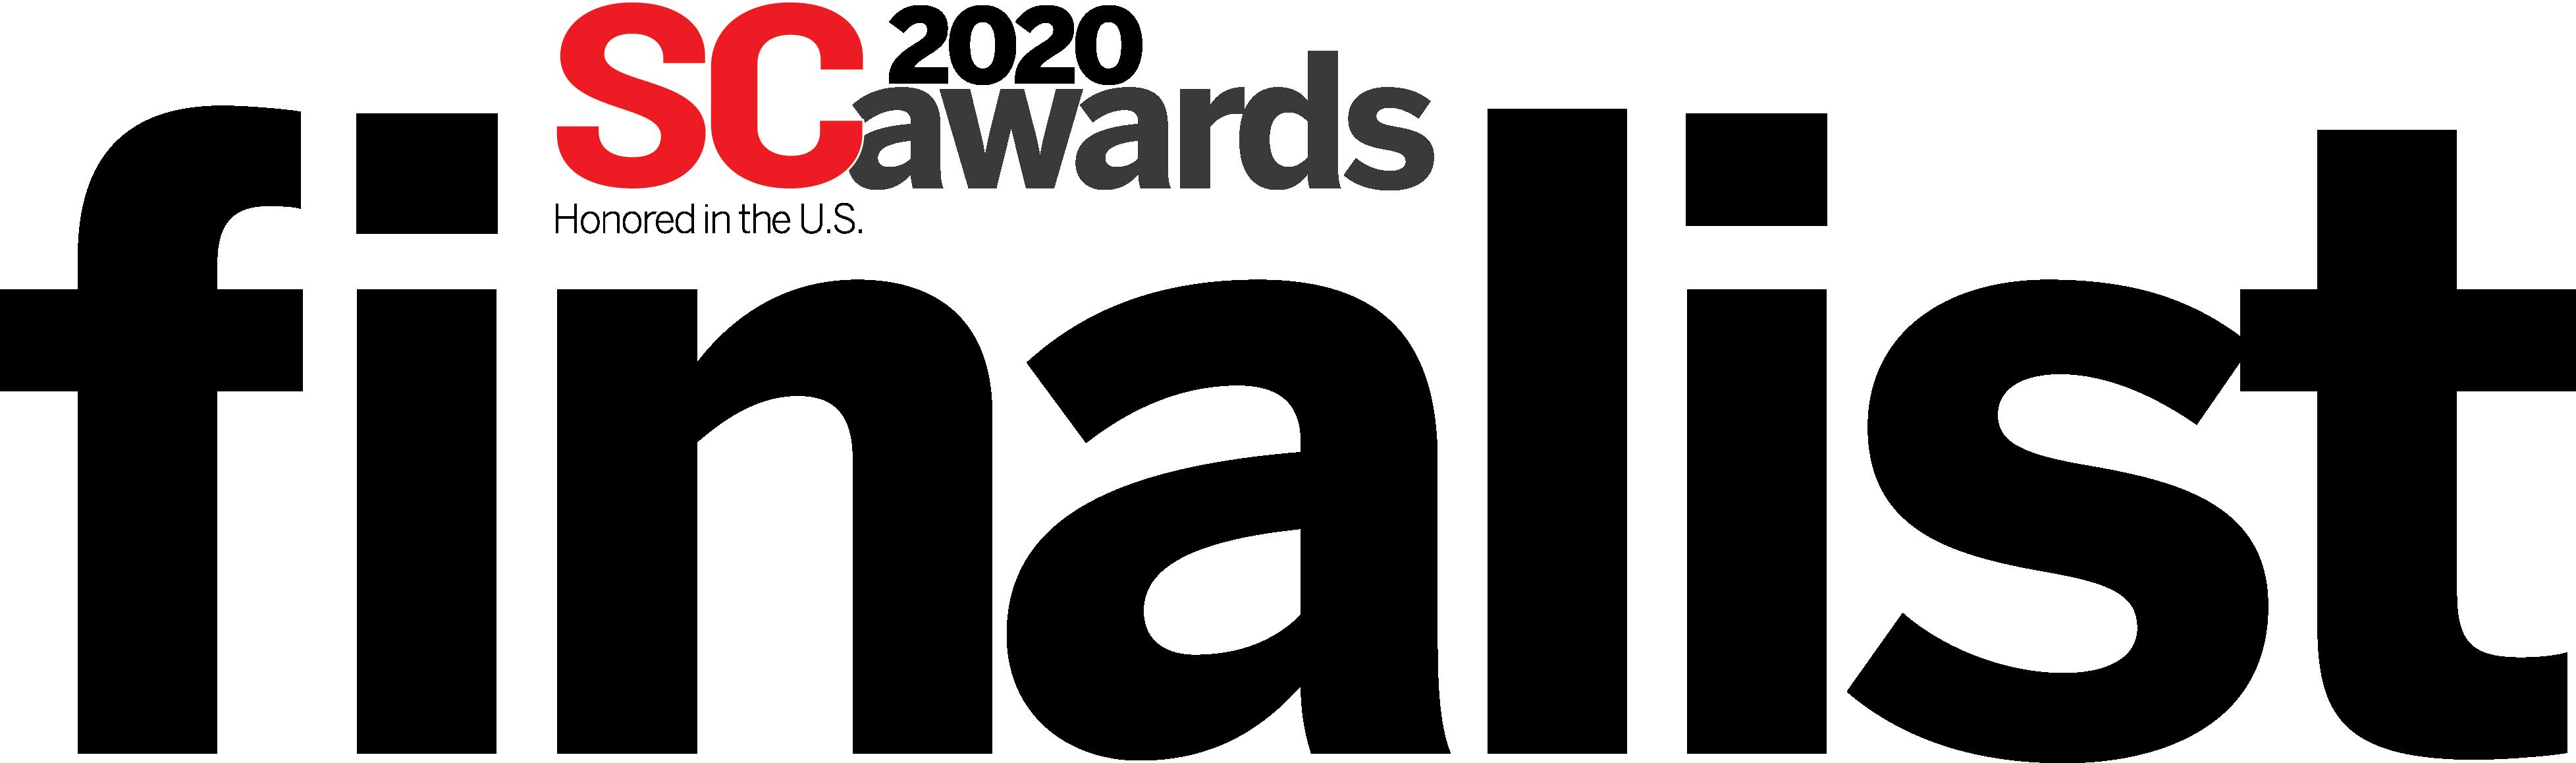 OneTrust Named SC Awards Finalist